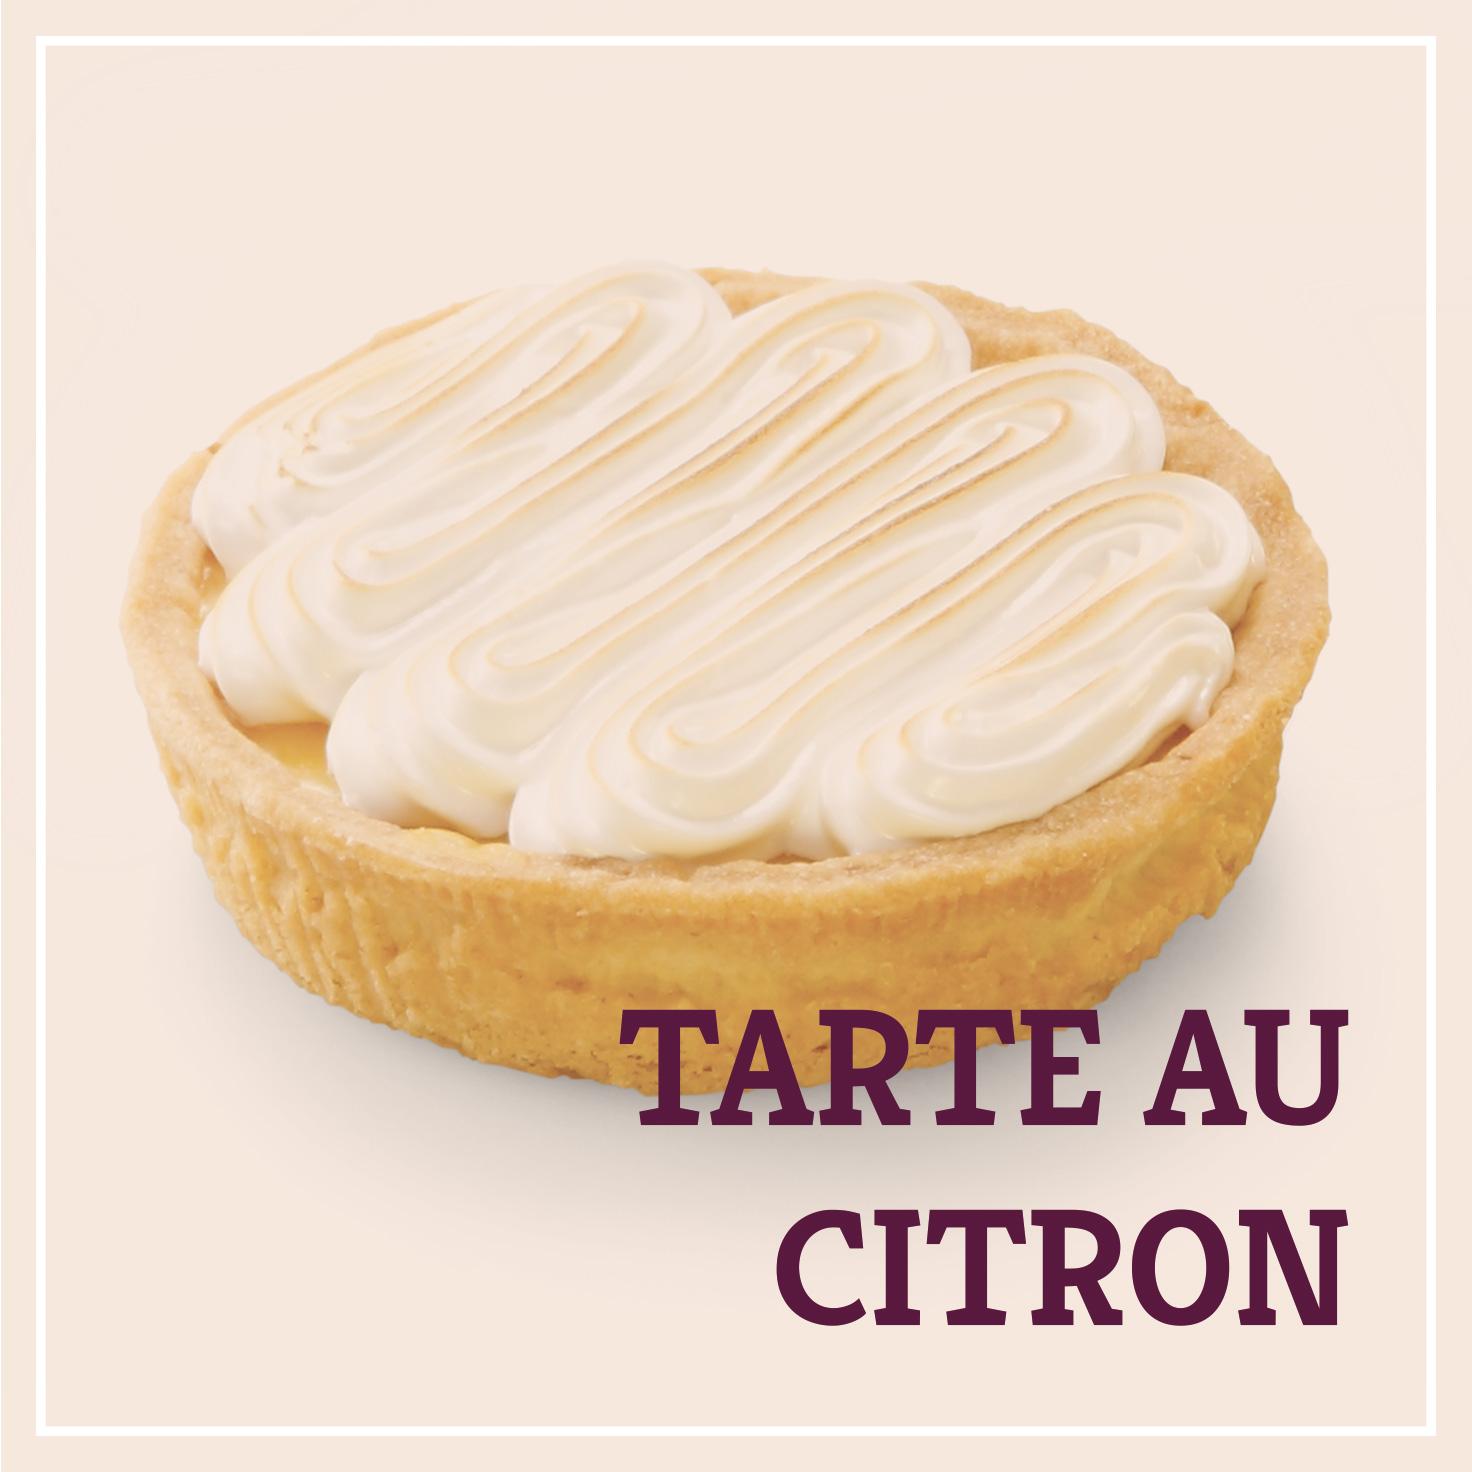 Heiss & Süß - Tarte au citron - Zitronentörtchen